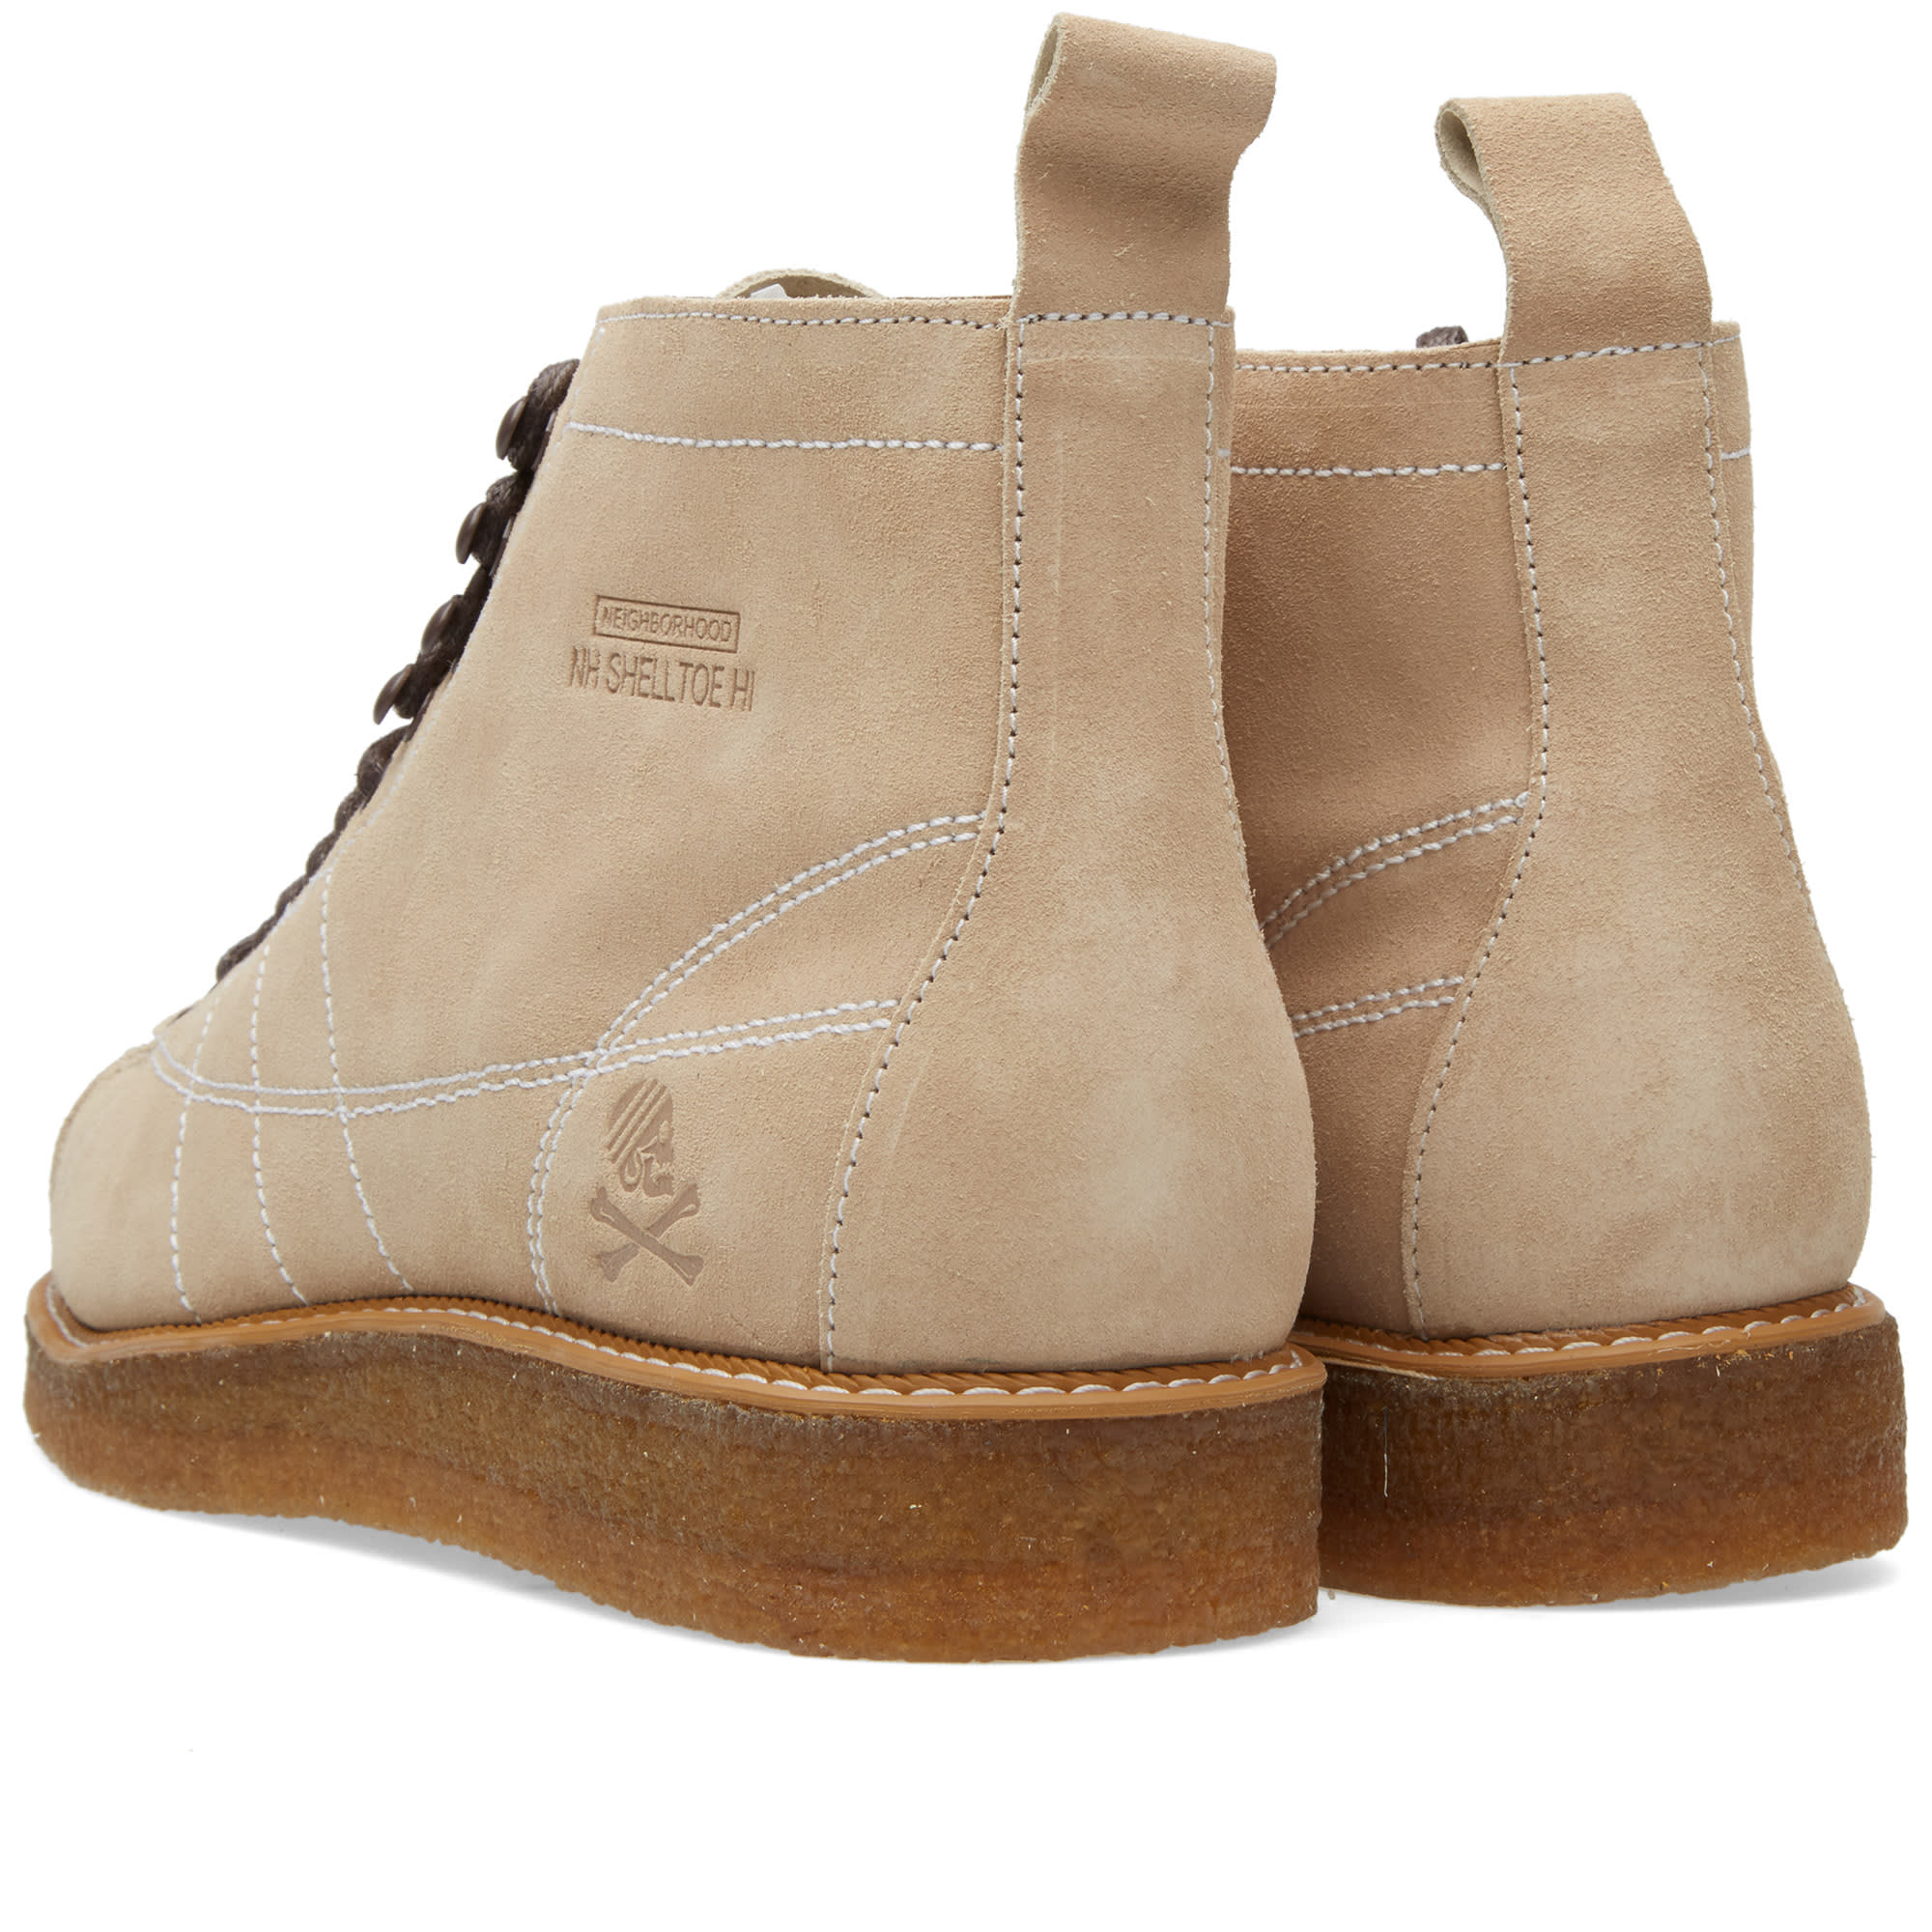 Adidas x Neighborhood Shelltoe Boot